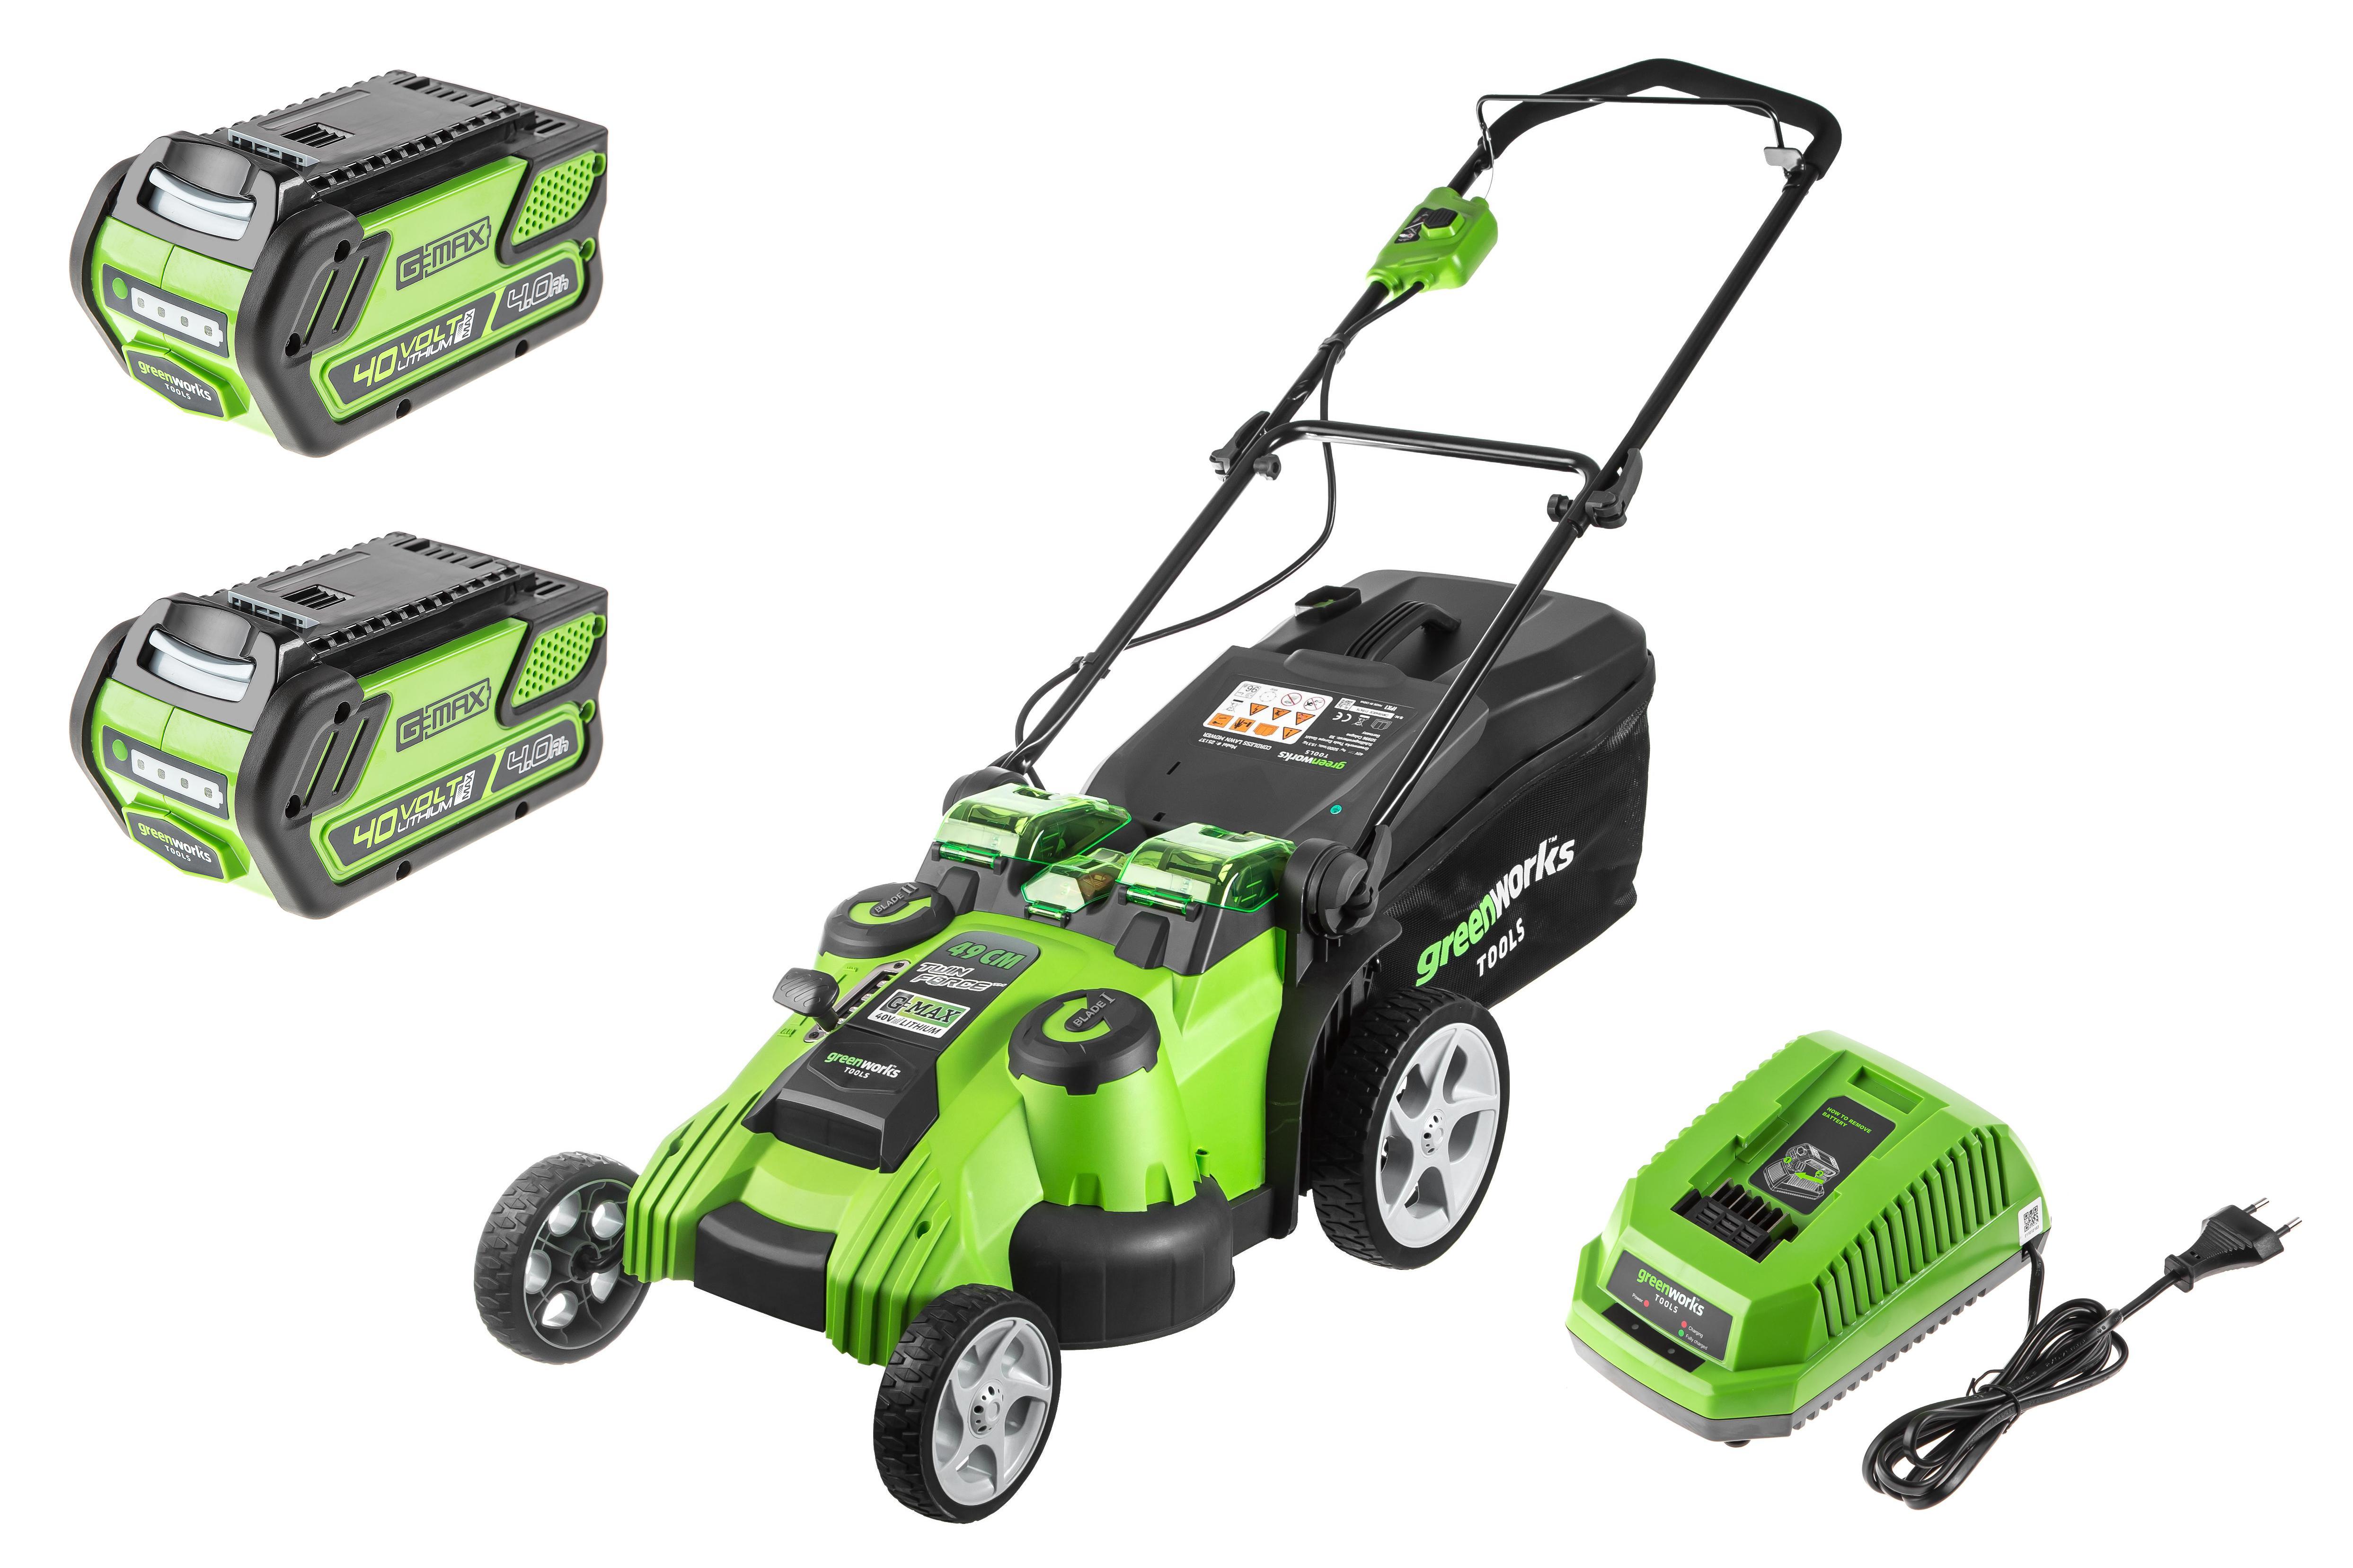 Аккумуляторная газонокосилка Greenworks G40lm49db (2500207) 1акк 40В 4Ач + ЗУ